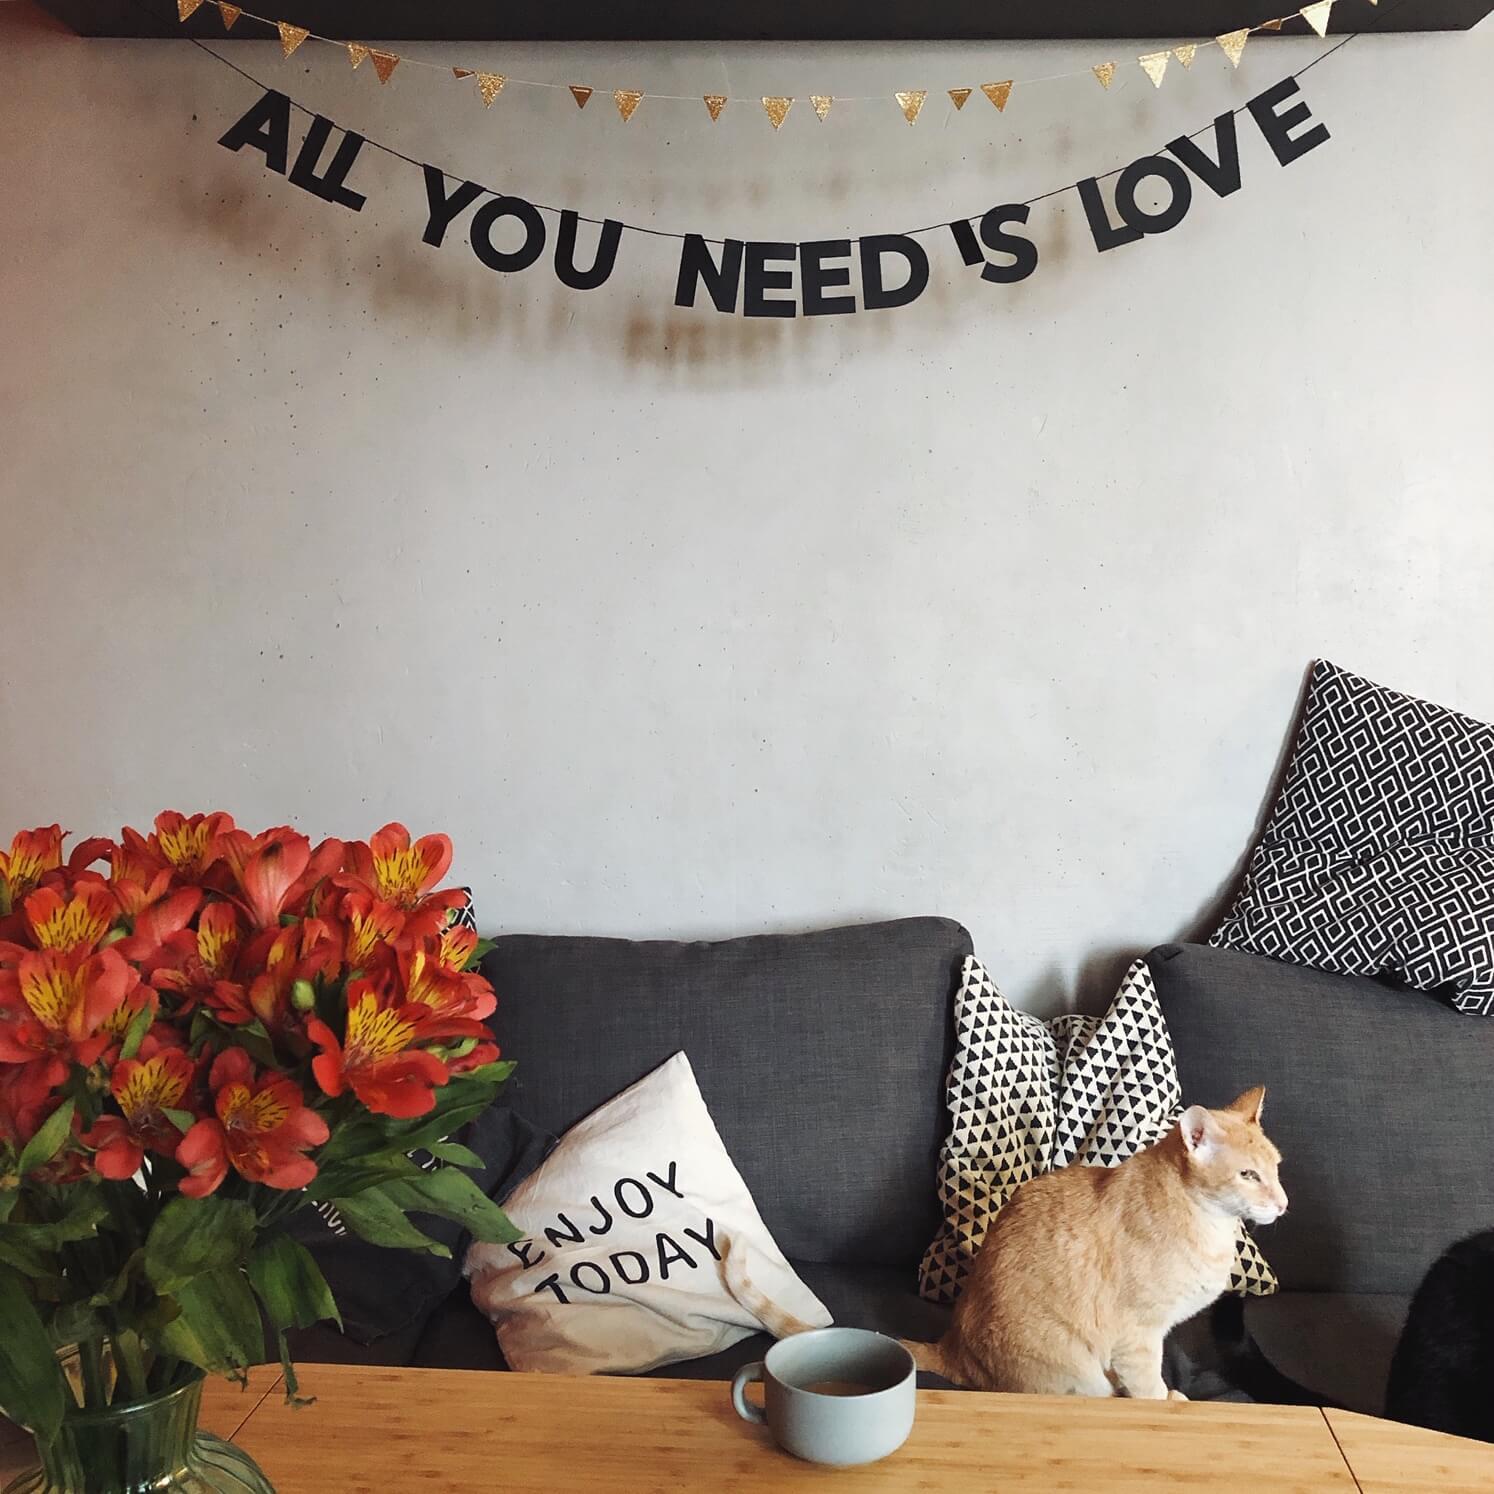 Купить Гирлянда ALL YOU NEED IS LOVE , taksebeprazdnik, Россия